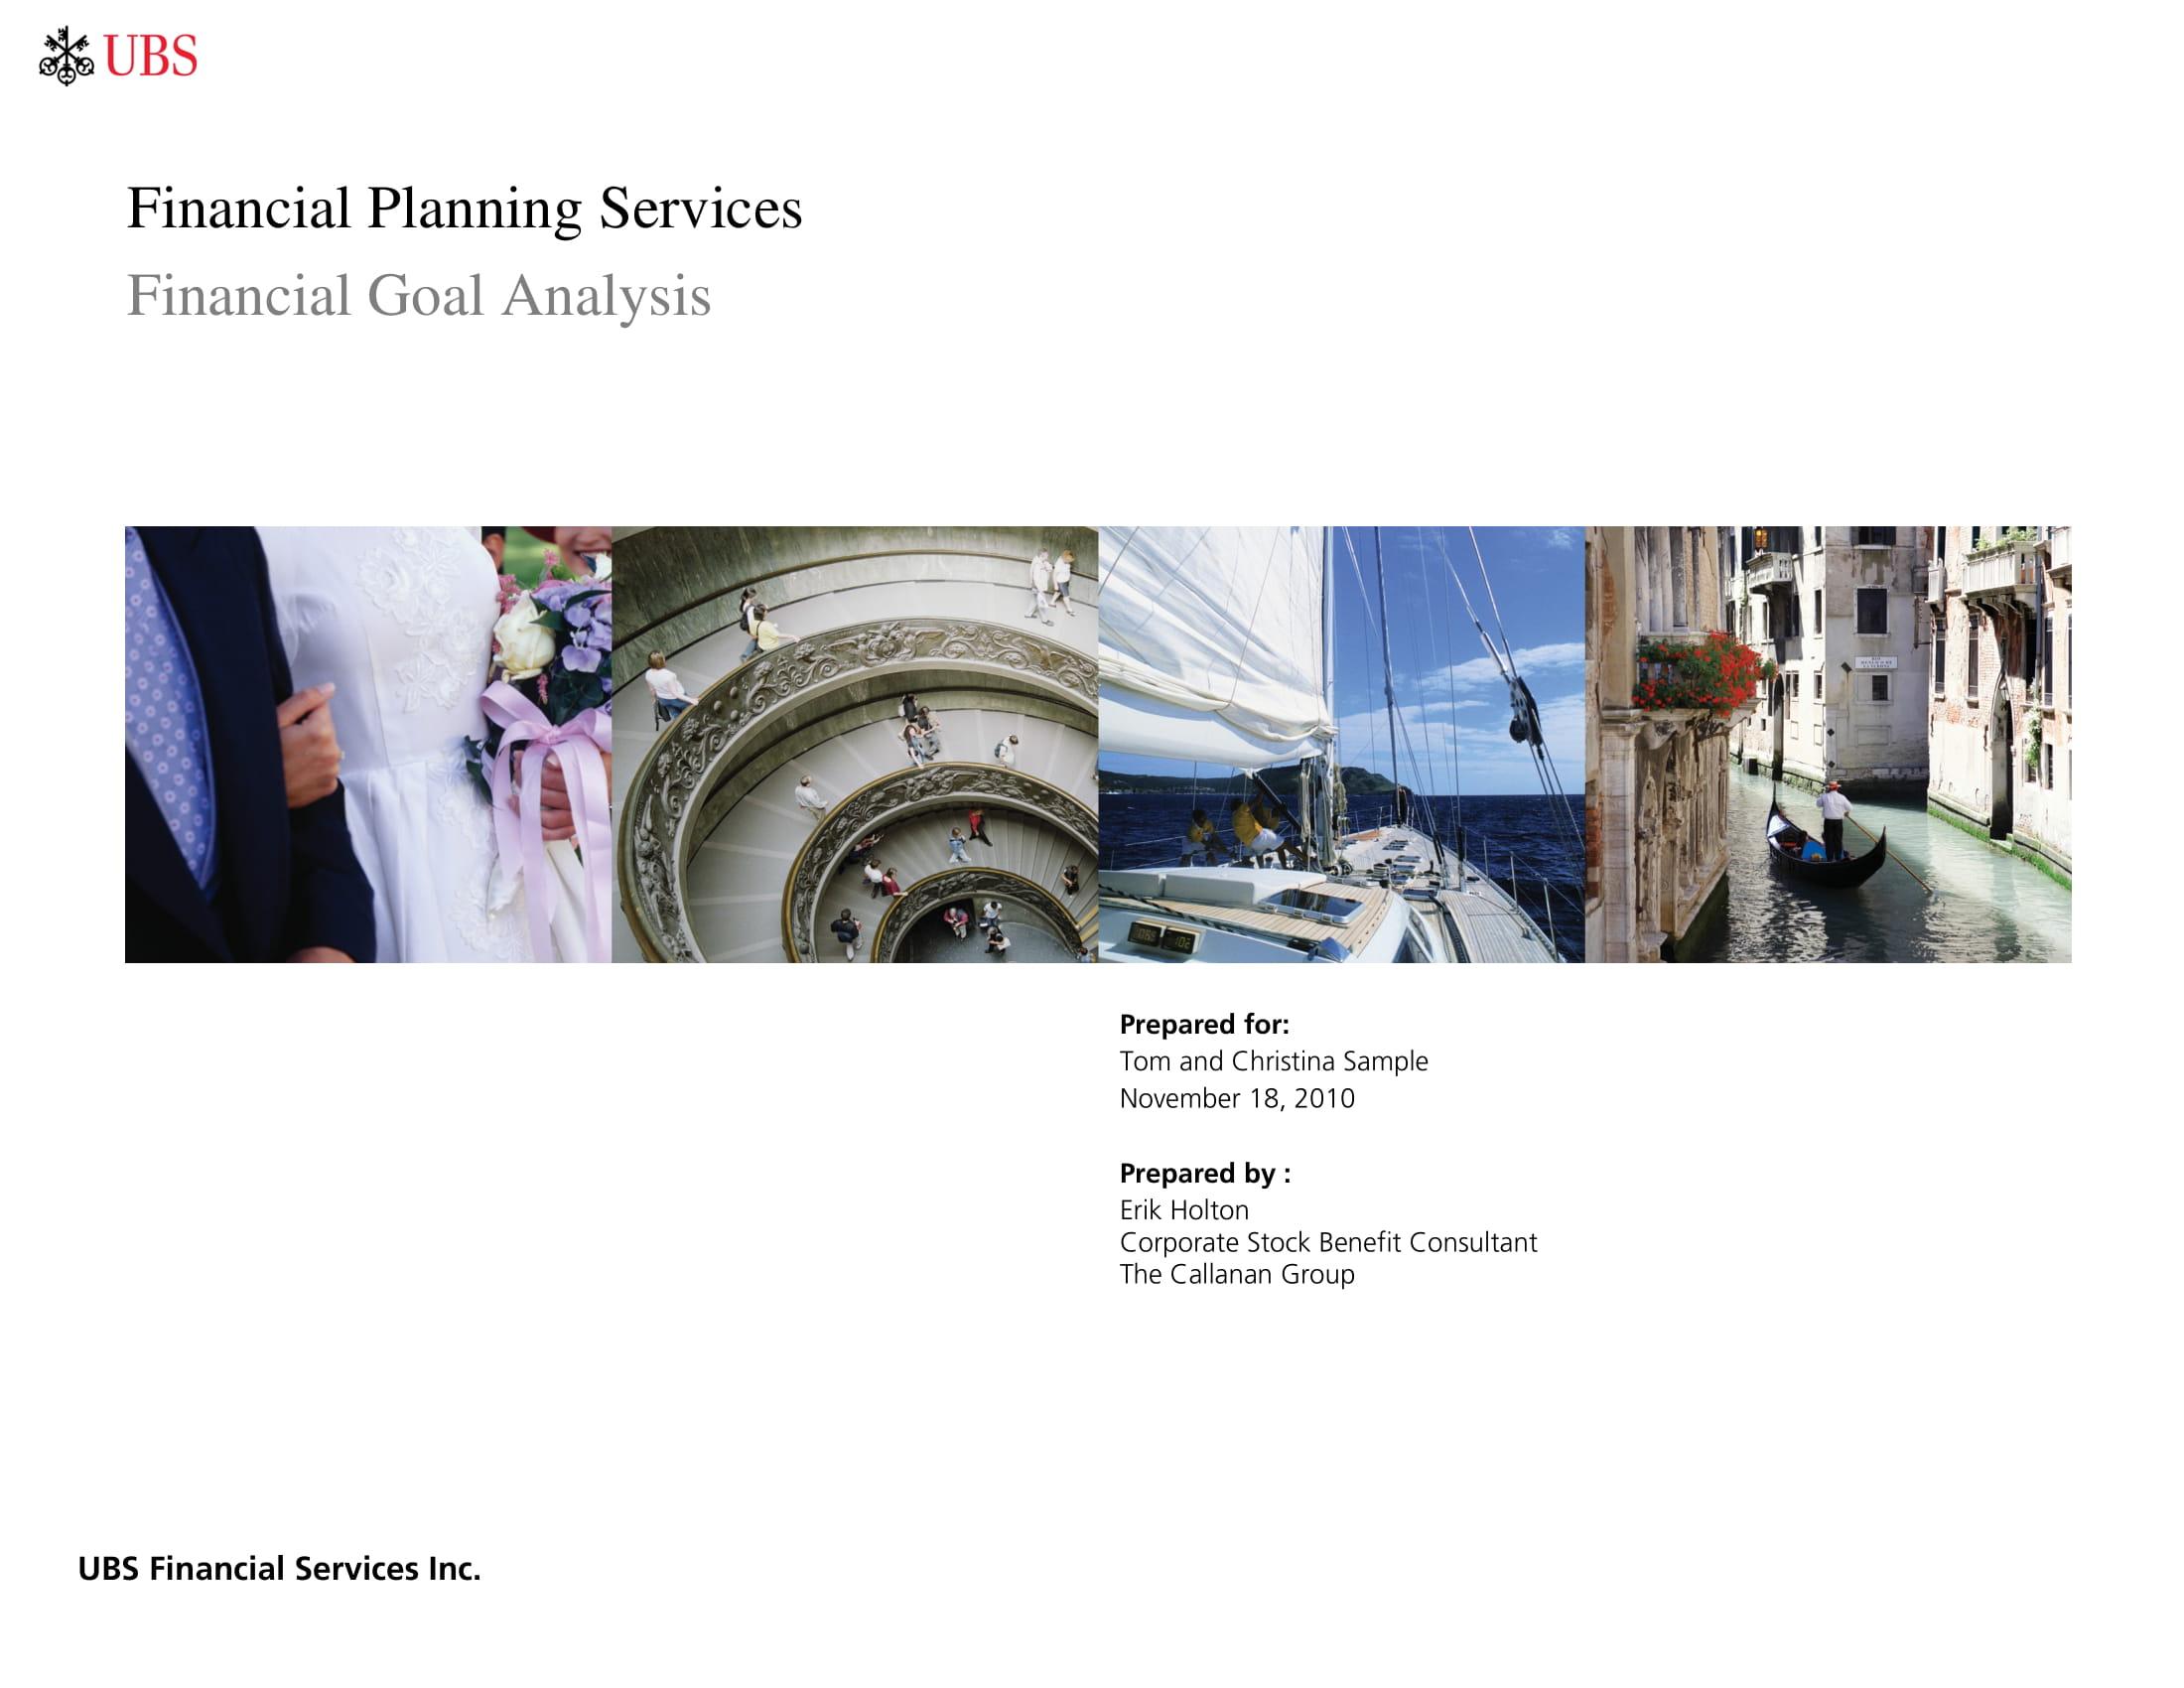 artg financial goal analysis